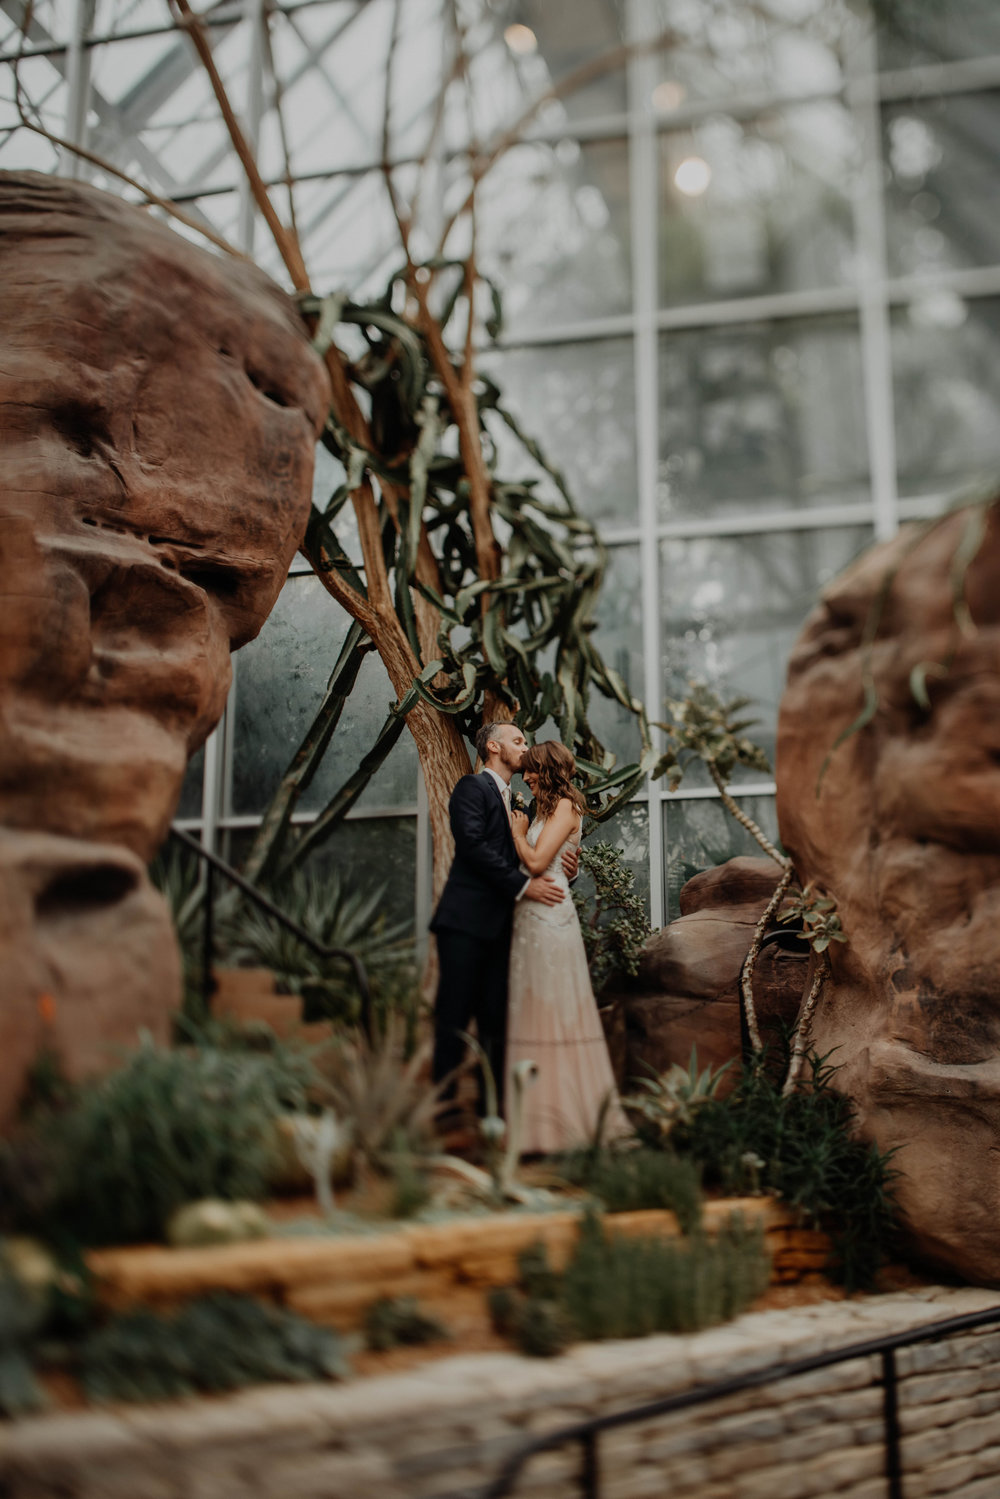 franklin park conservatory wedding columbus ohio wedding photographer grace e jones photography53.jpg